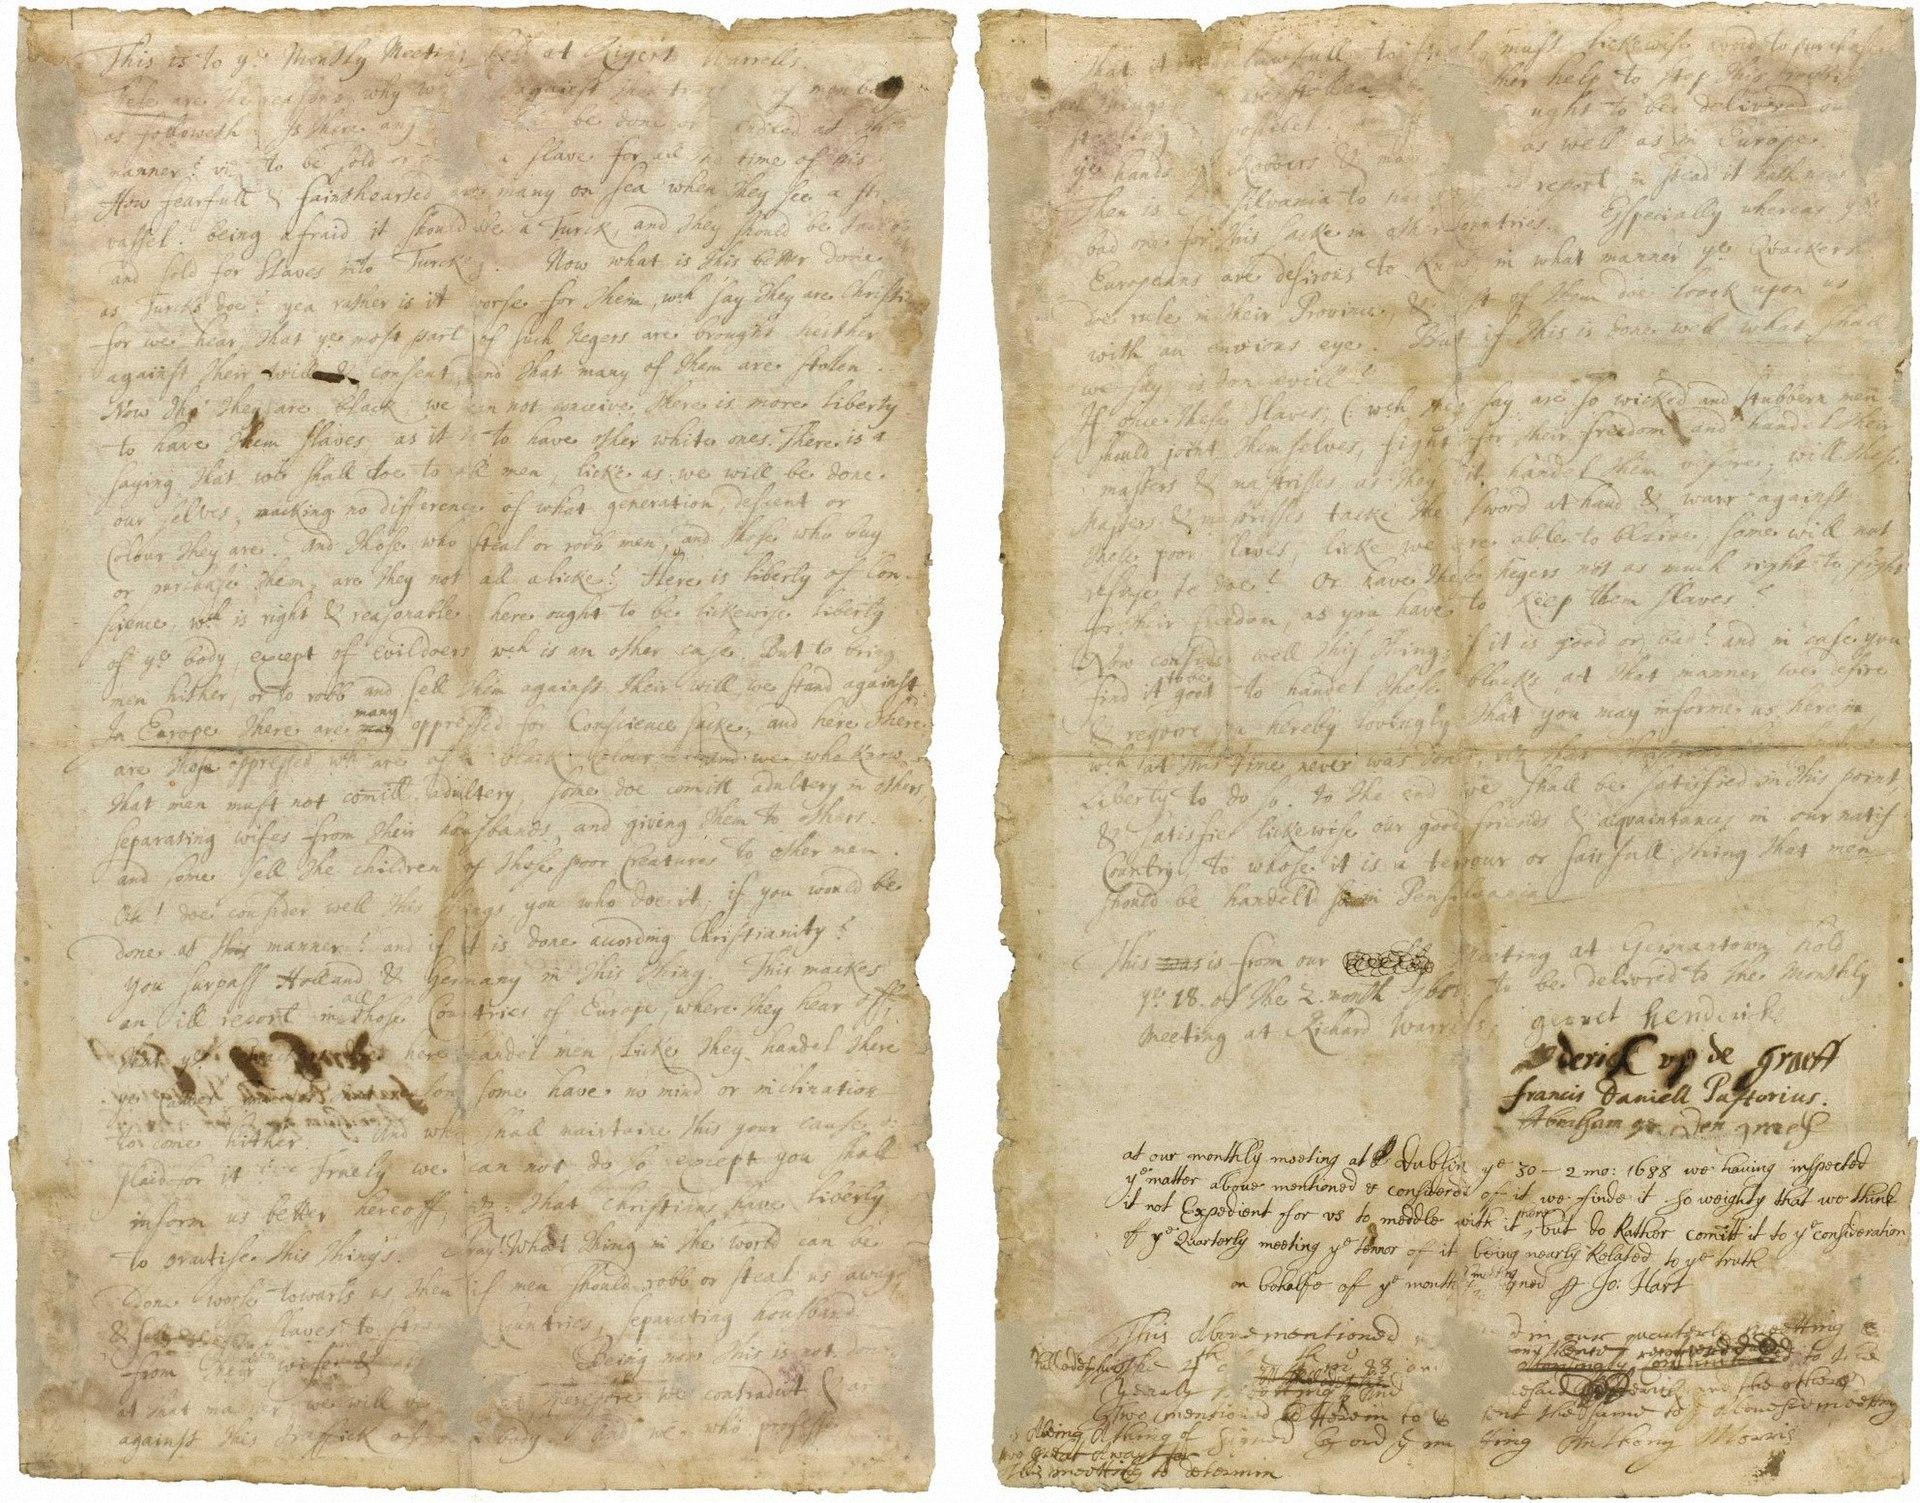 1688 Germantown petition against slavery, on parchment paper